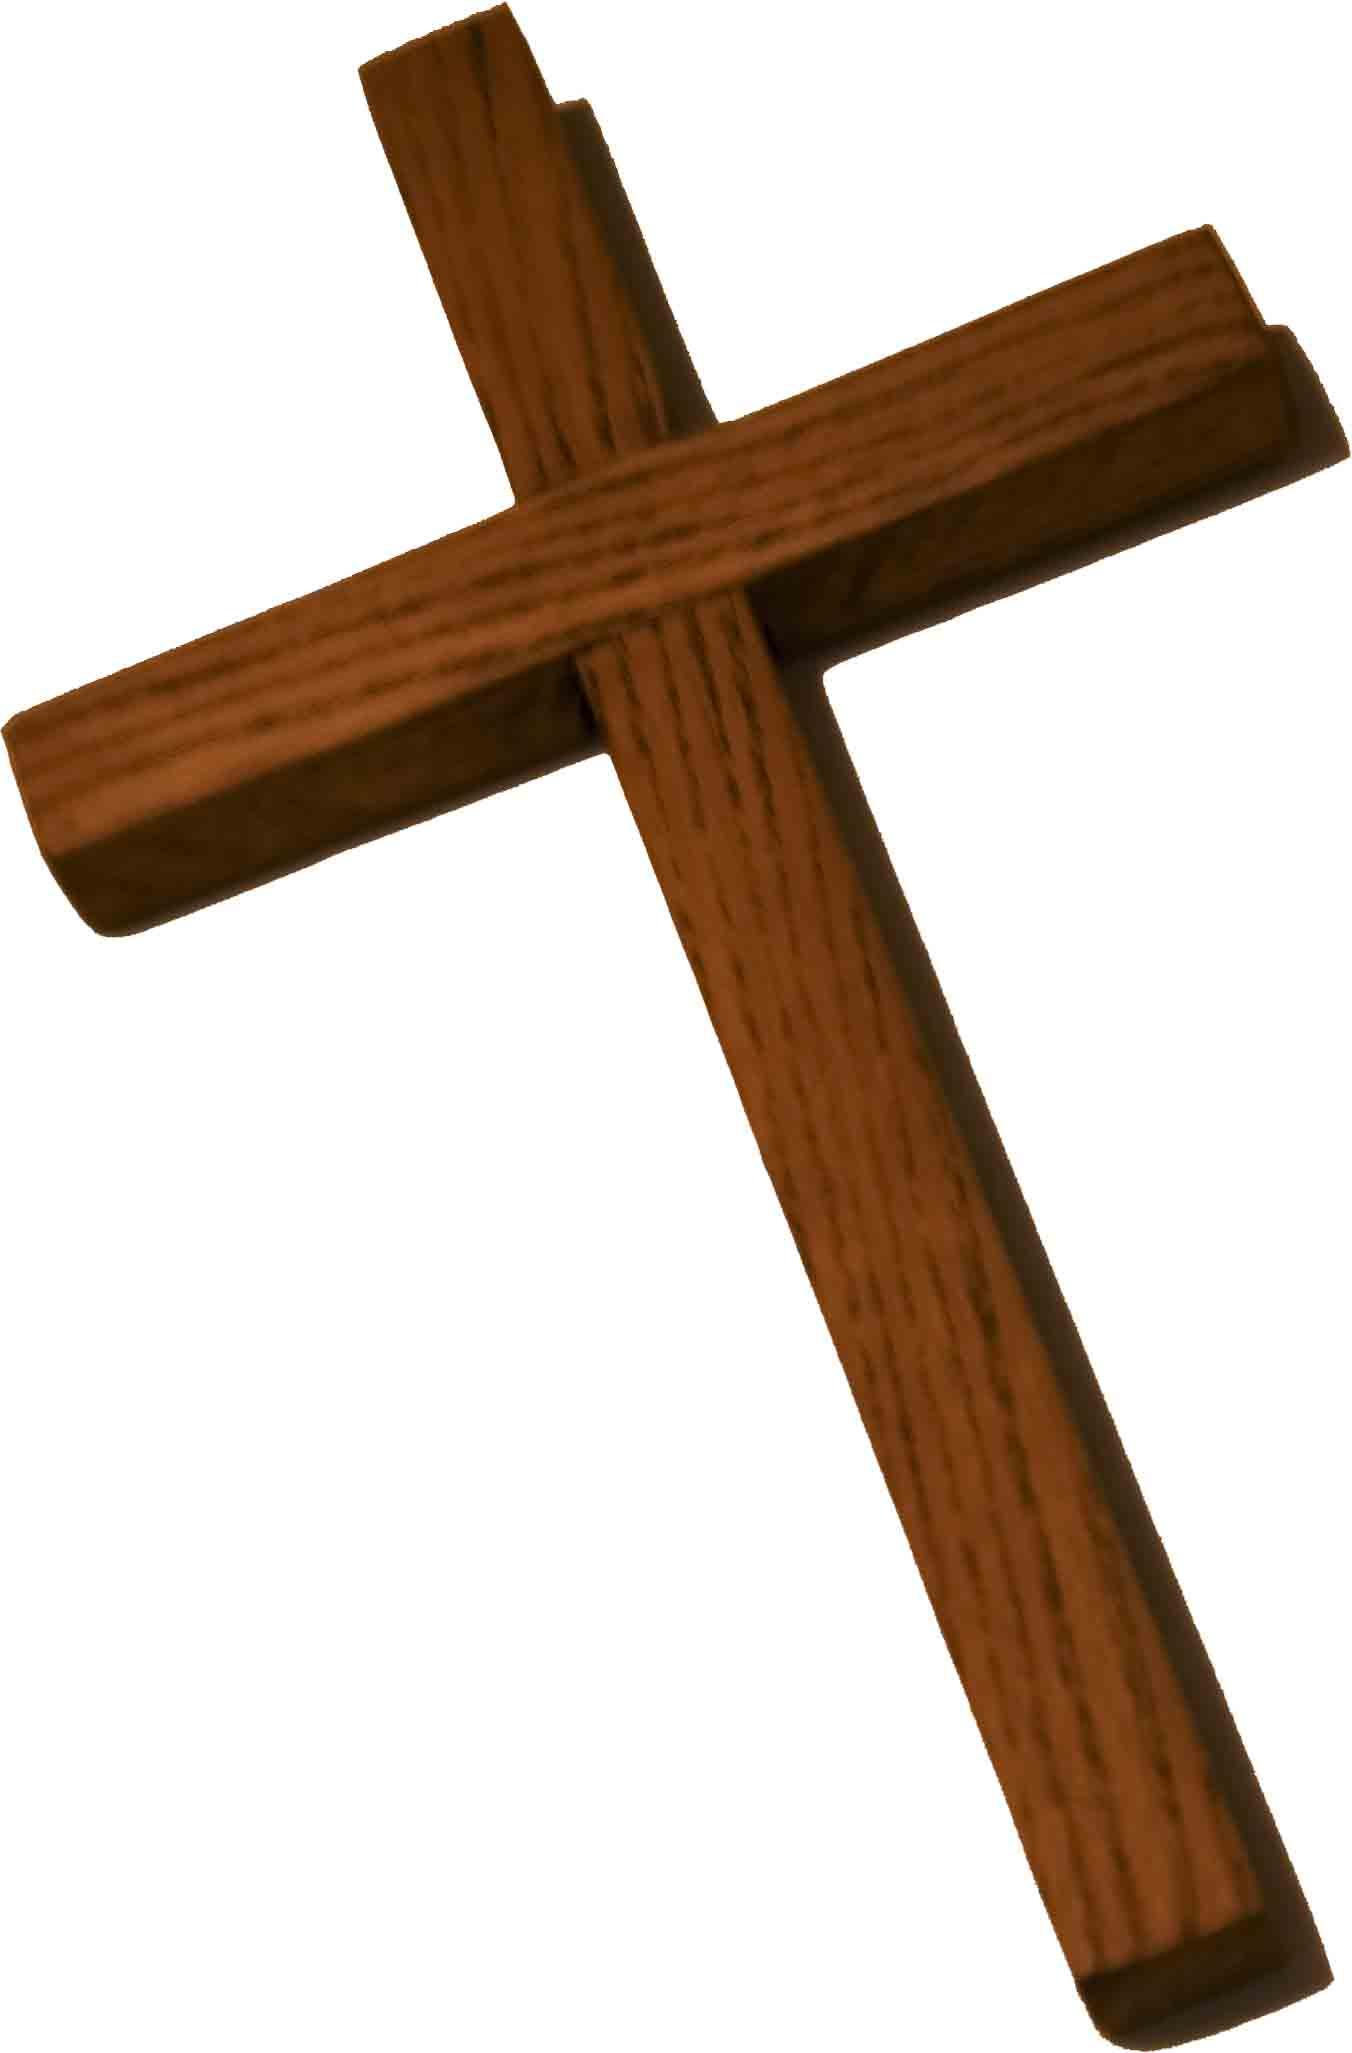 1352x2053 Free Clipart Wooden Cross